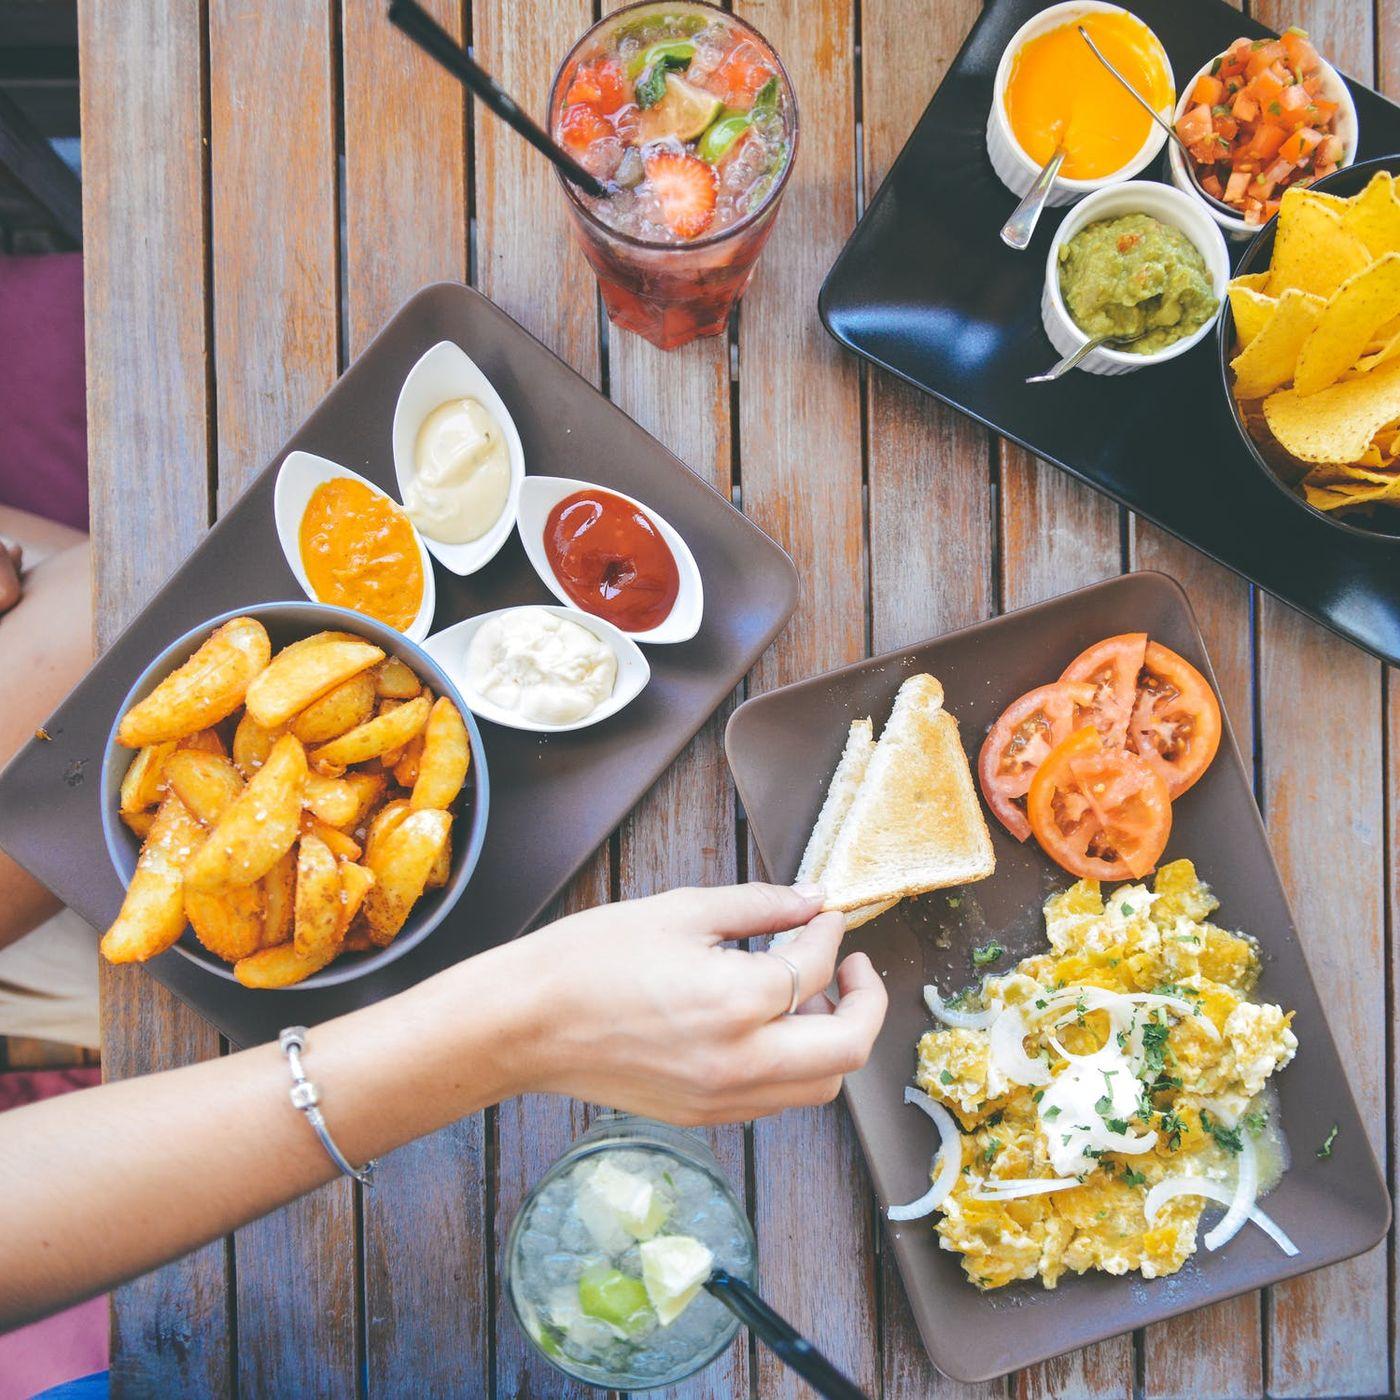 Eating Finger Foods